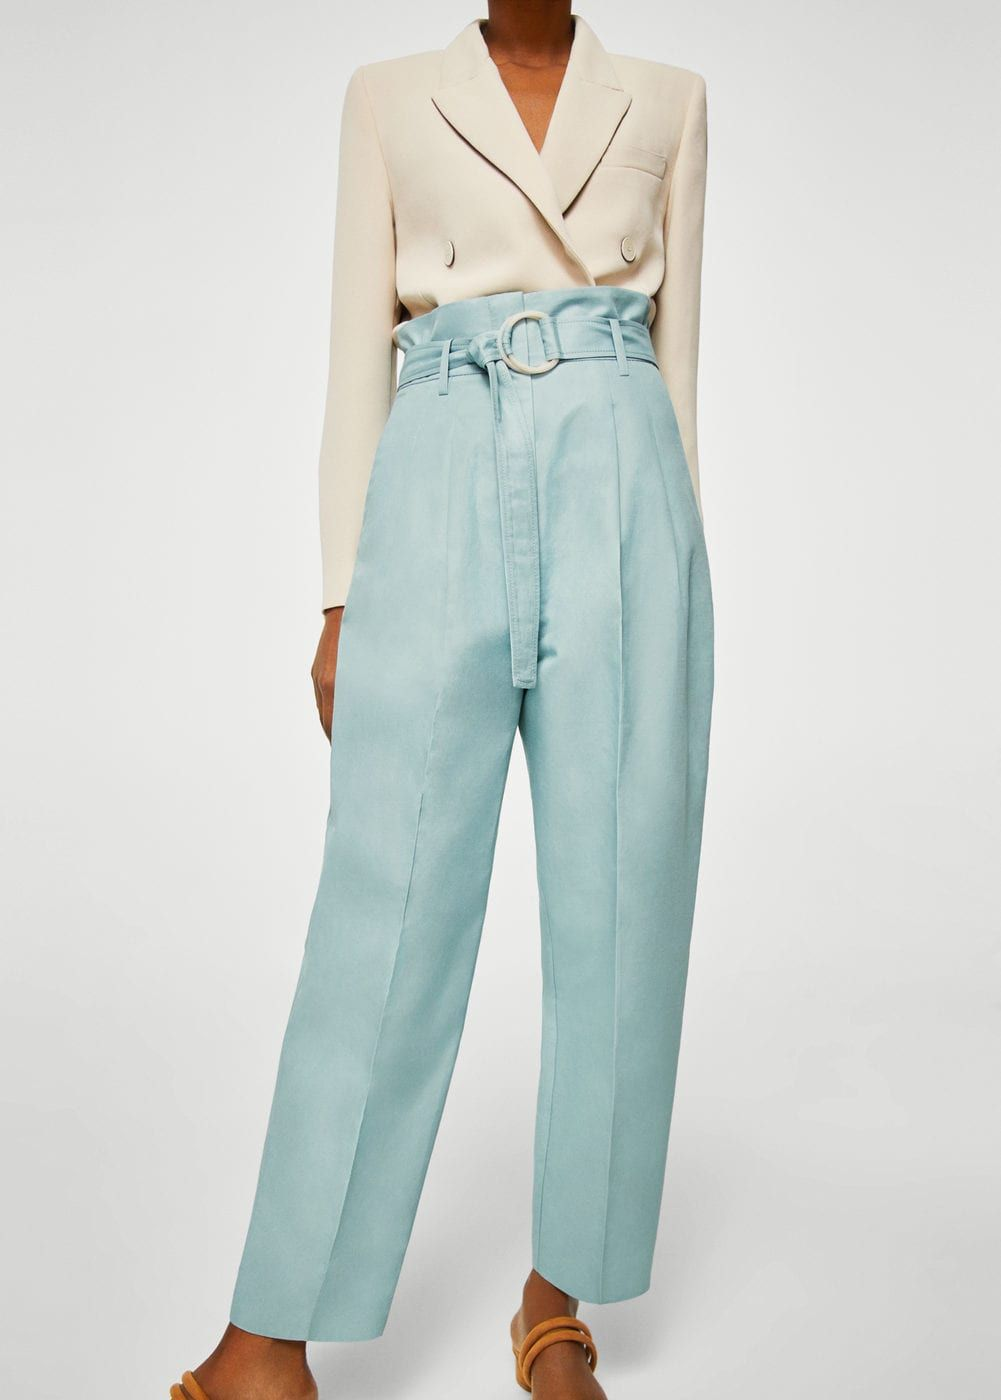 Korte Broek Dames Hoge Taille.Paper Bag Broek Dames S S Fashion Broeken En Mango